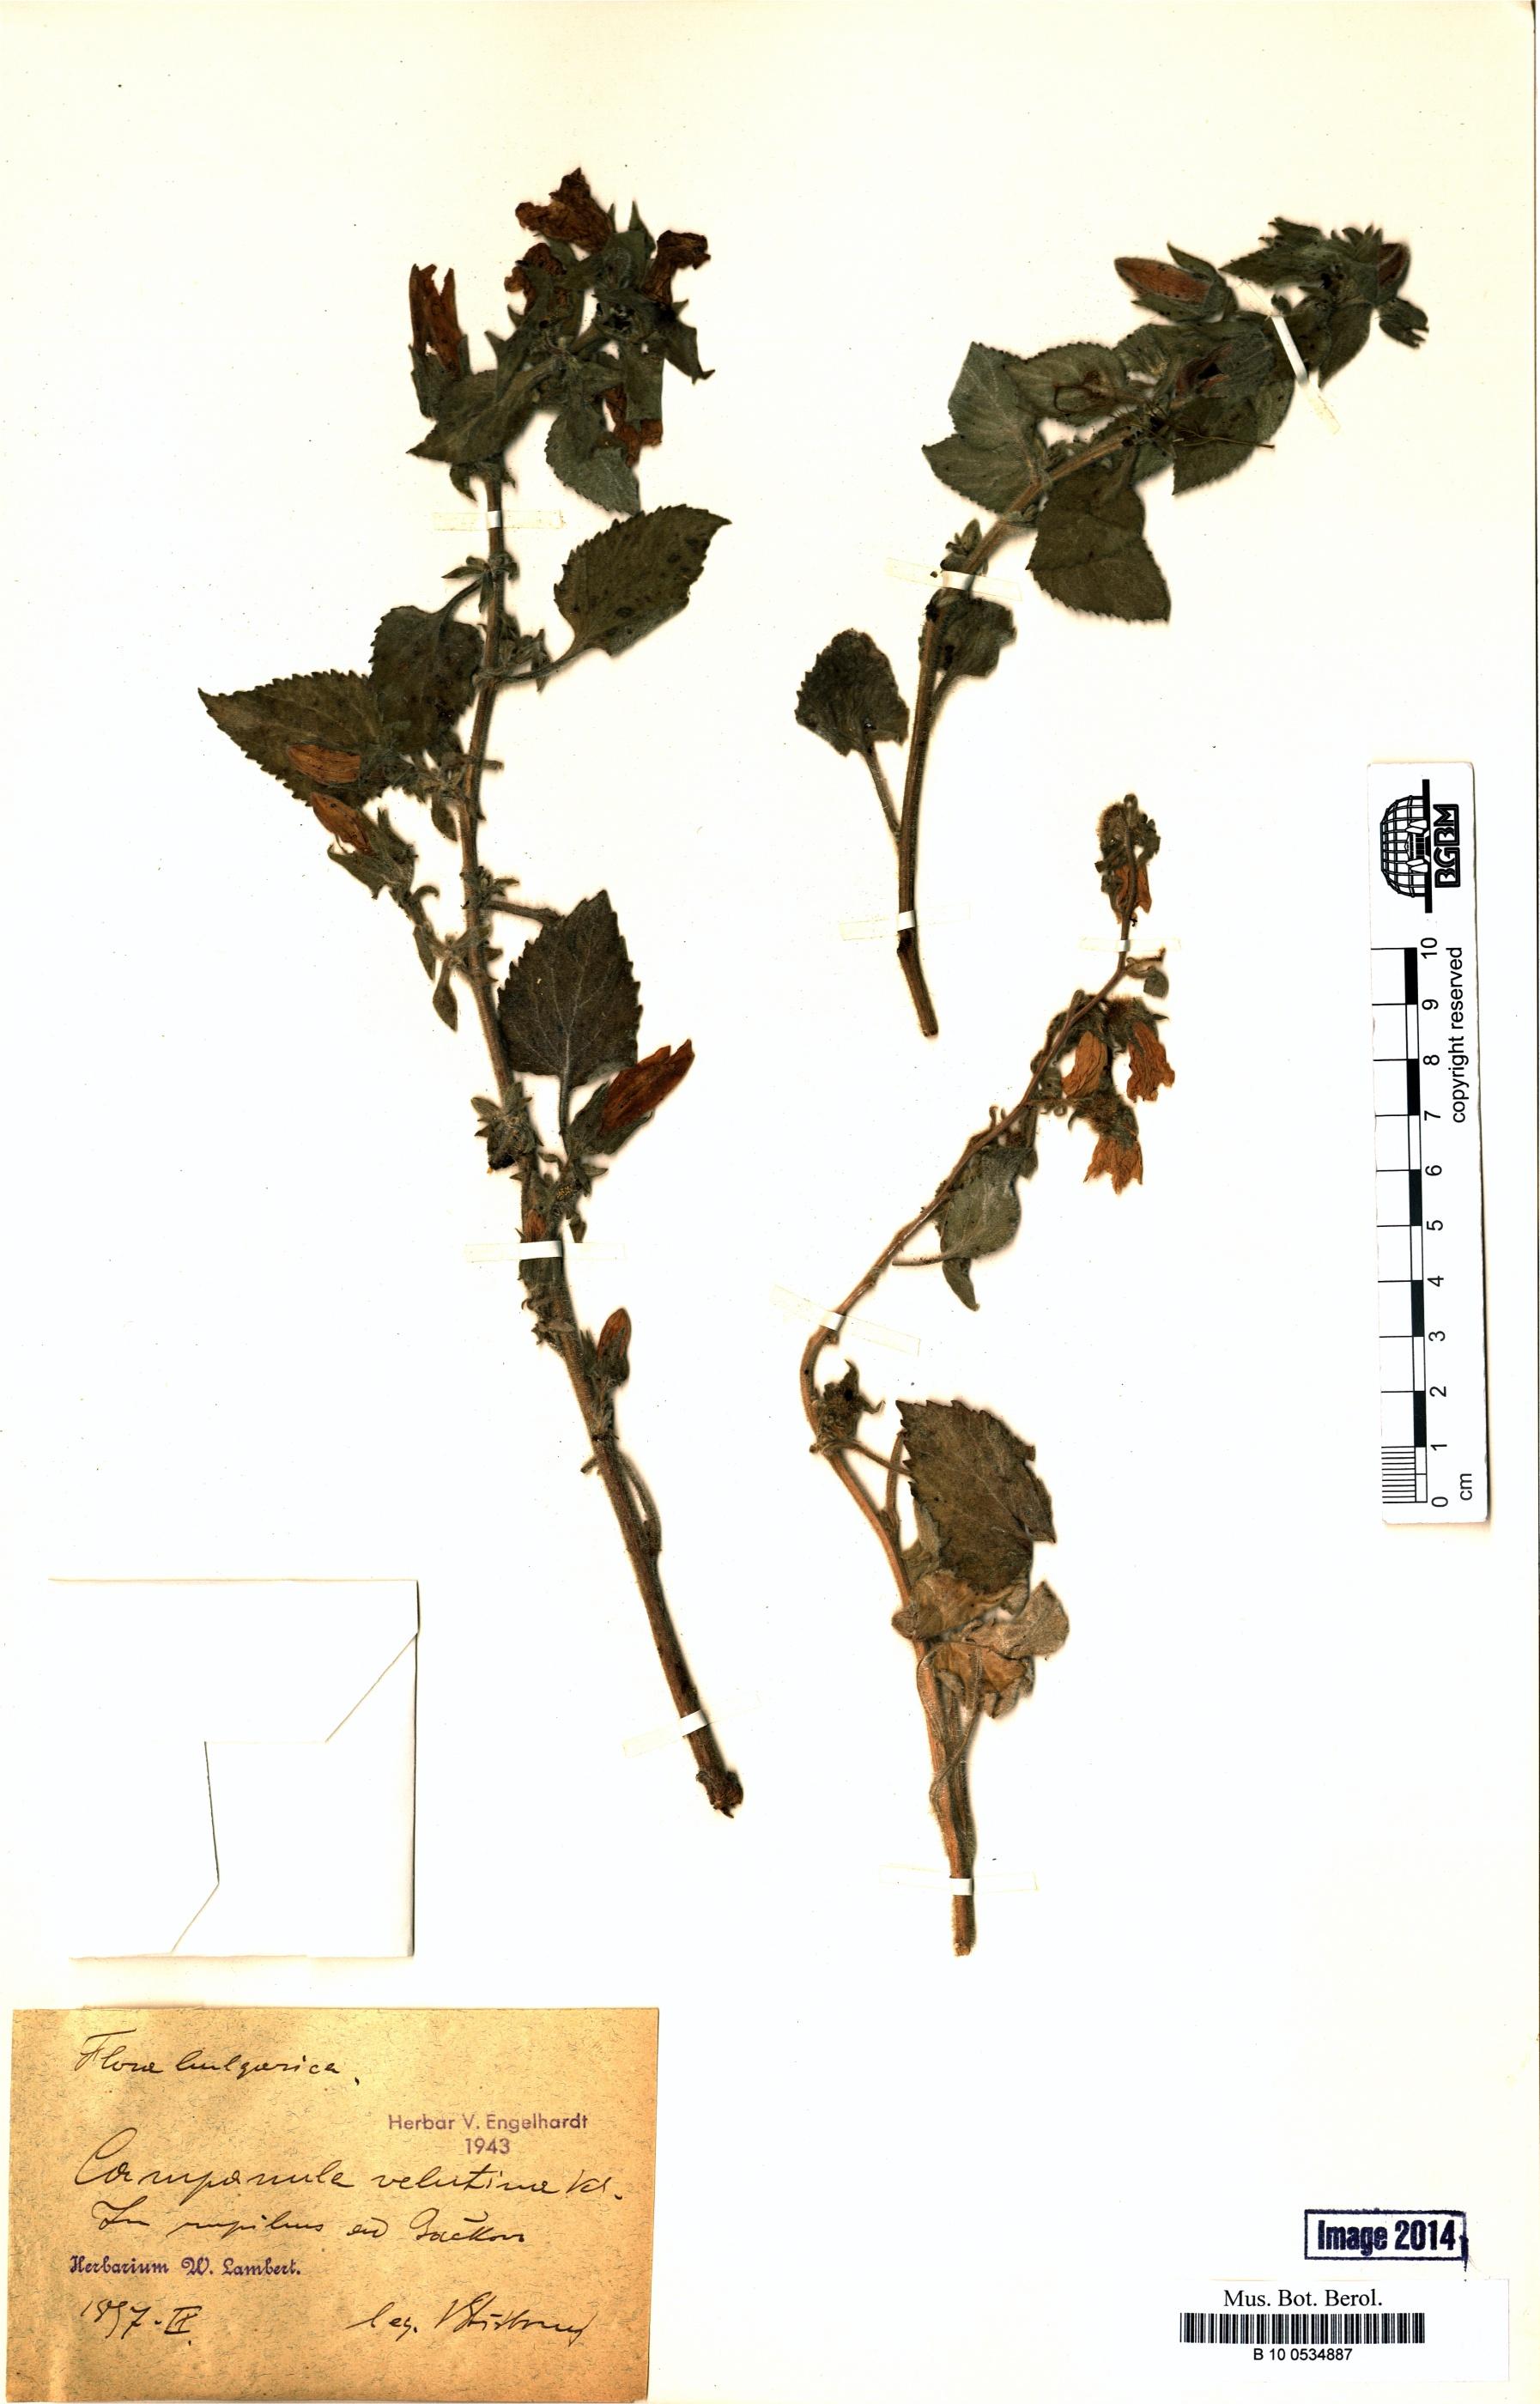 http://ww2.bgbm.org/herbarium/images/B/10/05/34/88/B_10_0534887.jpg